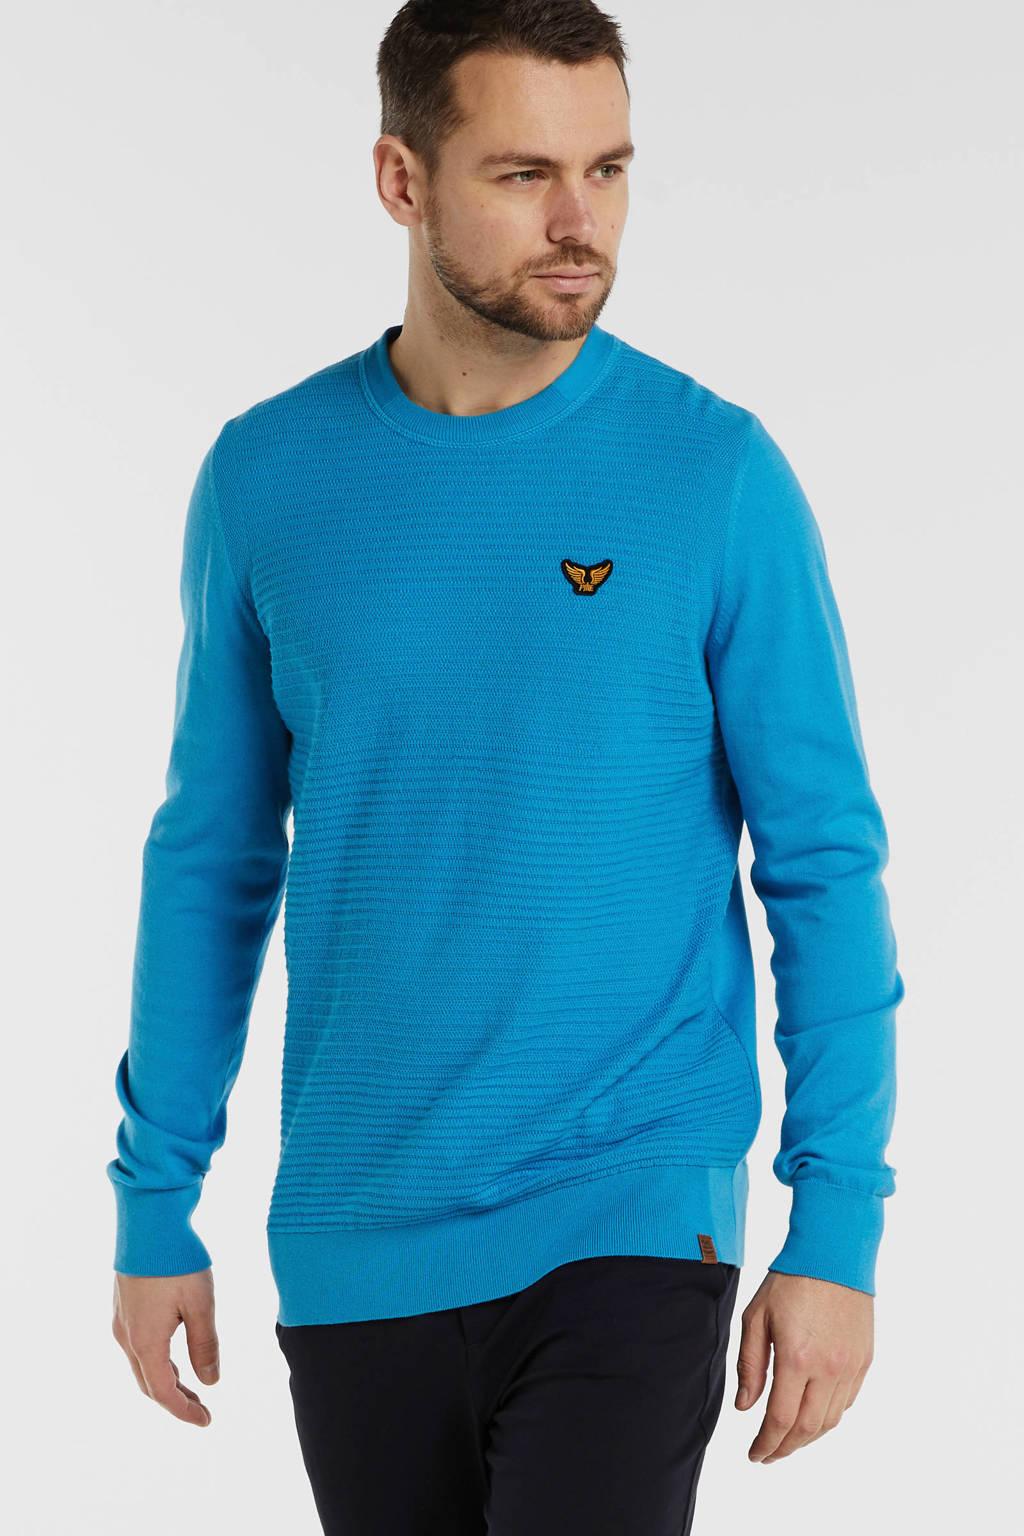 PME Legend sweater met logo blauw, Blauw